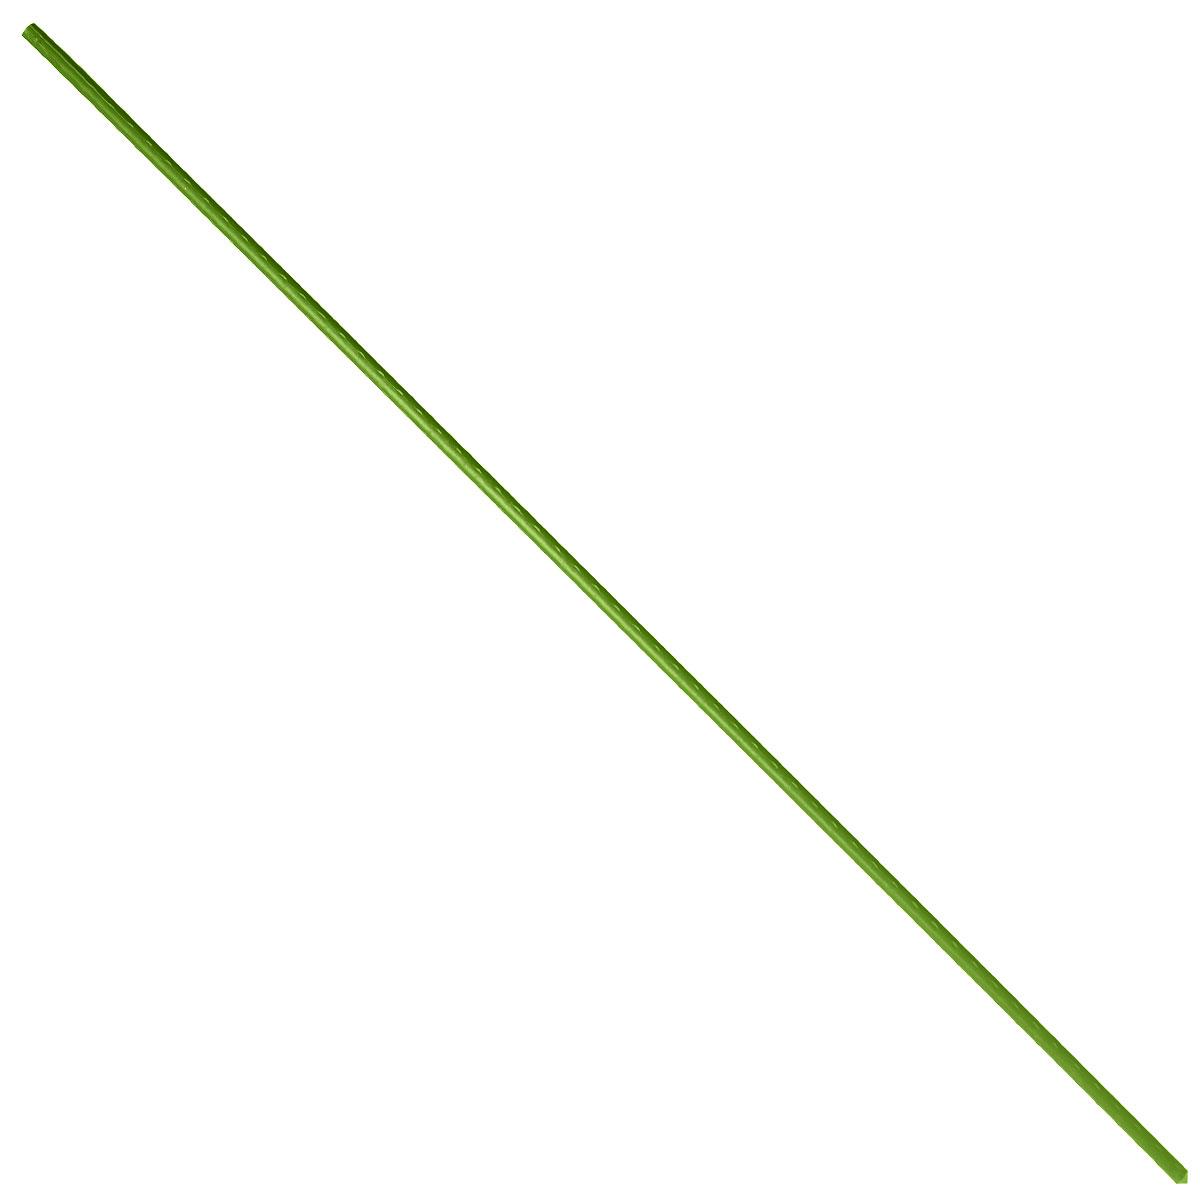 Опора для растений Green Apple, цвет: зеленый, диаметр 1,1 см, длина 90 см, 5 шт комплект для вьющихся растений сборный green apple glscl